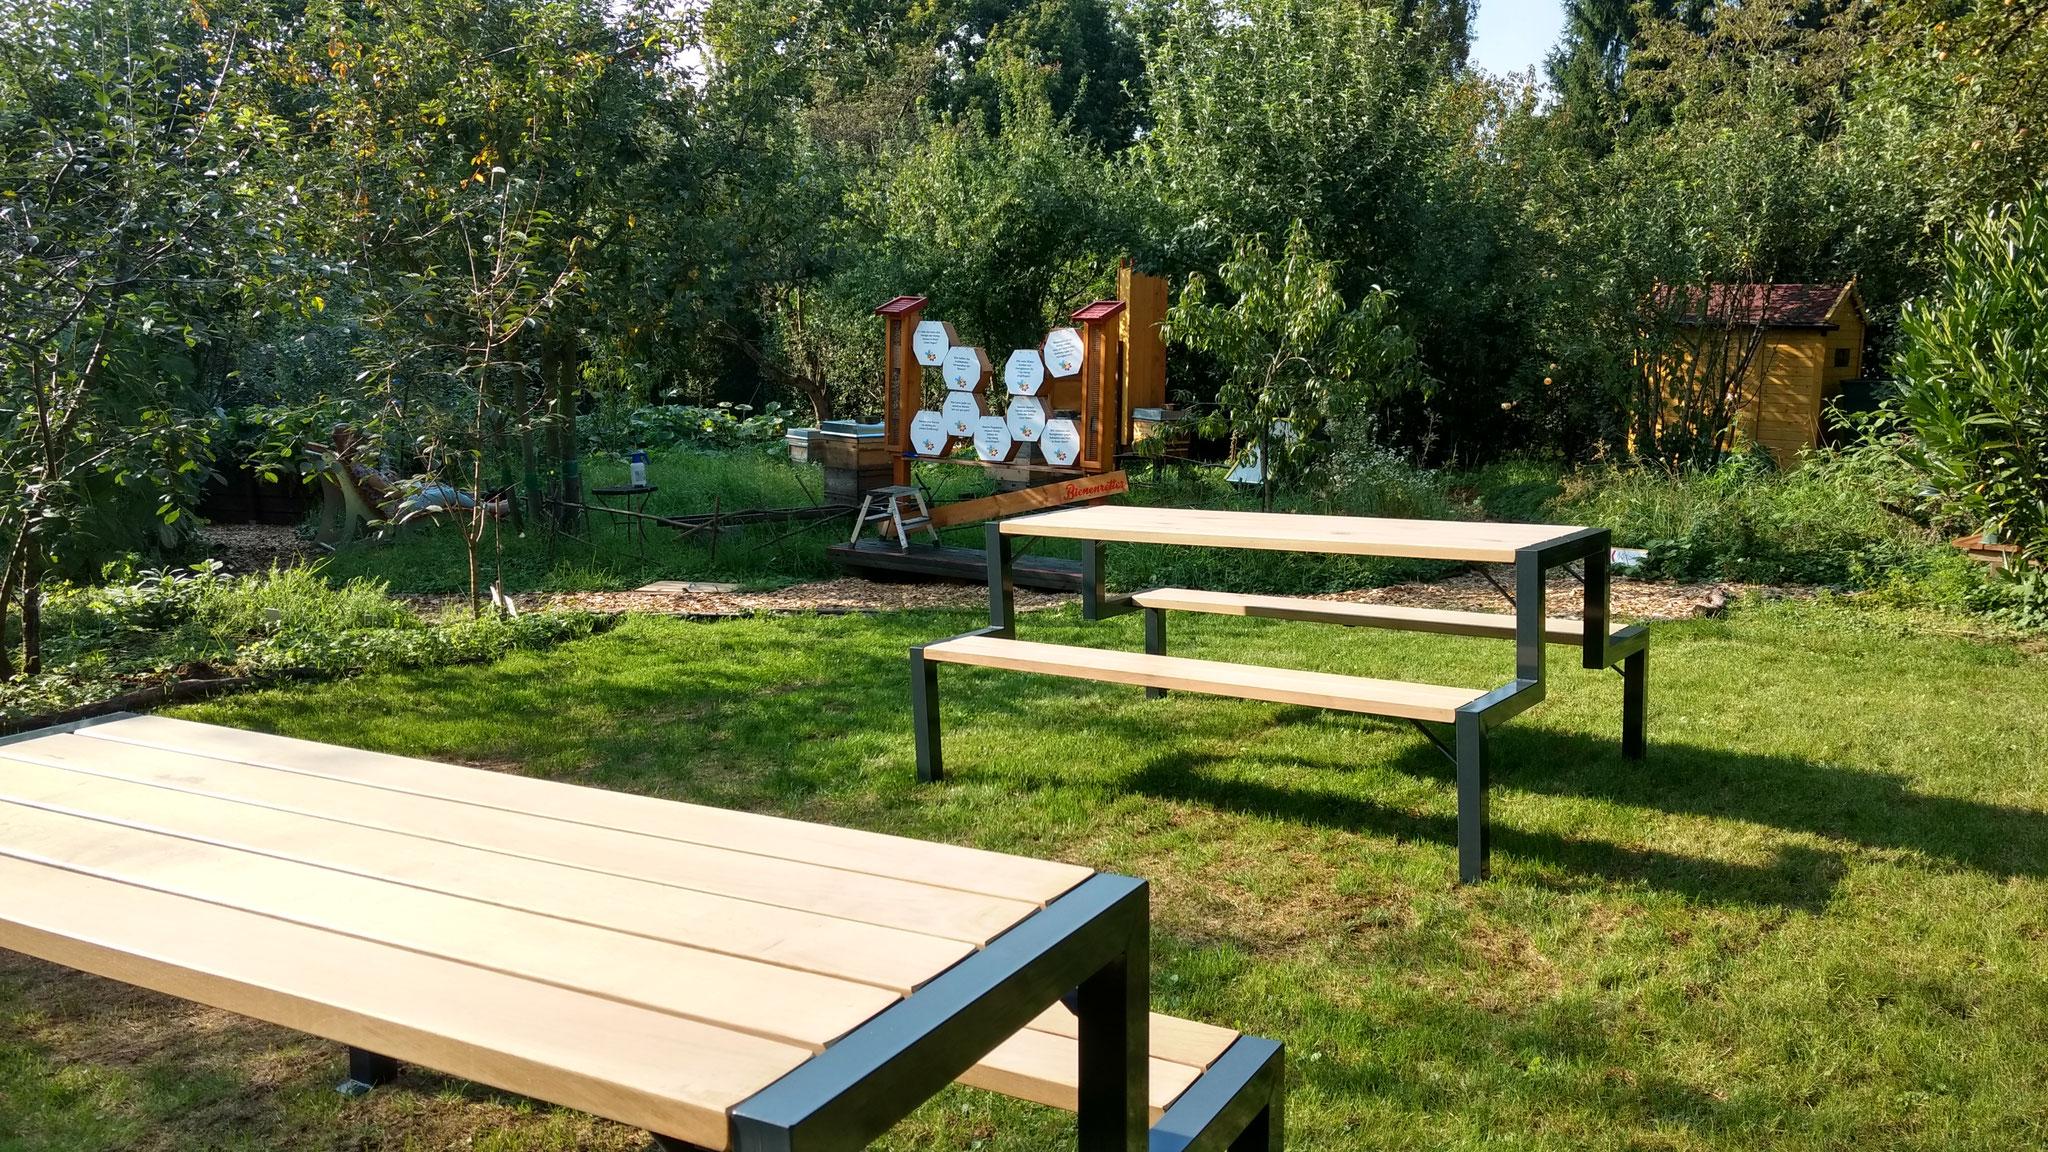 Programm Führungen Im Bienenretter Garten Bienenretter Projekt